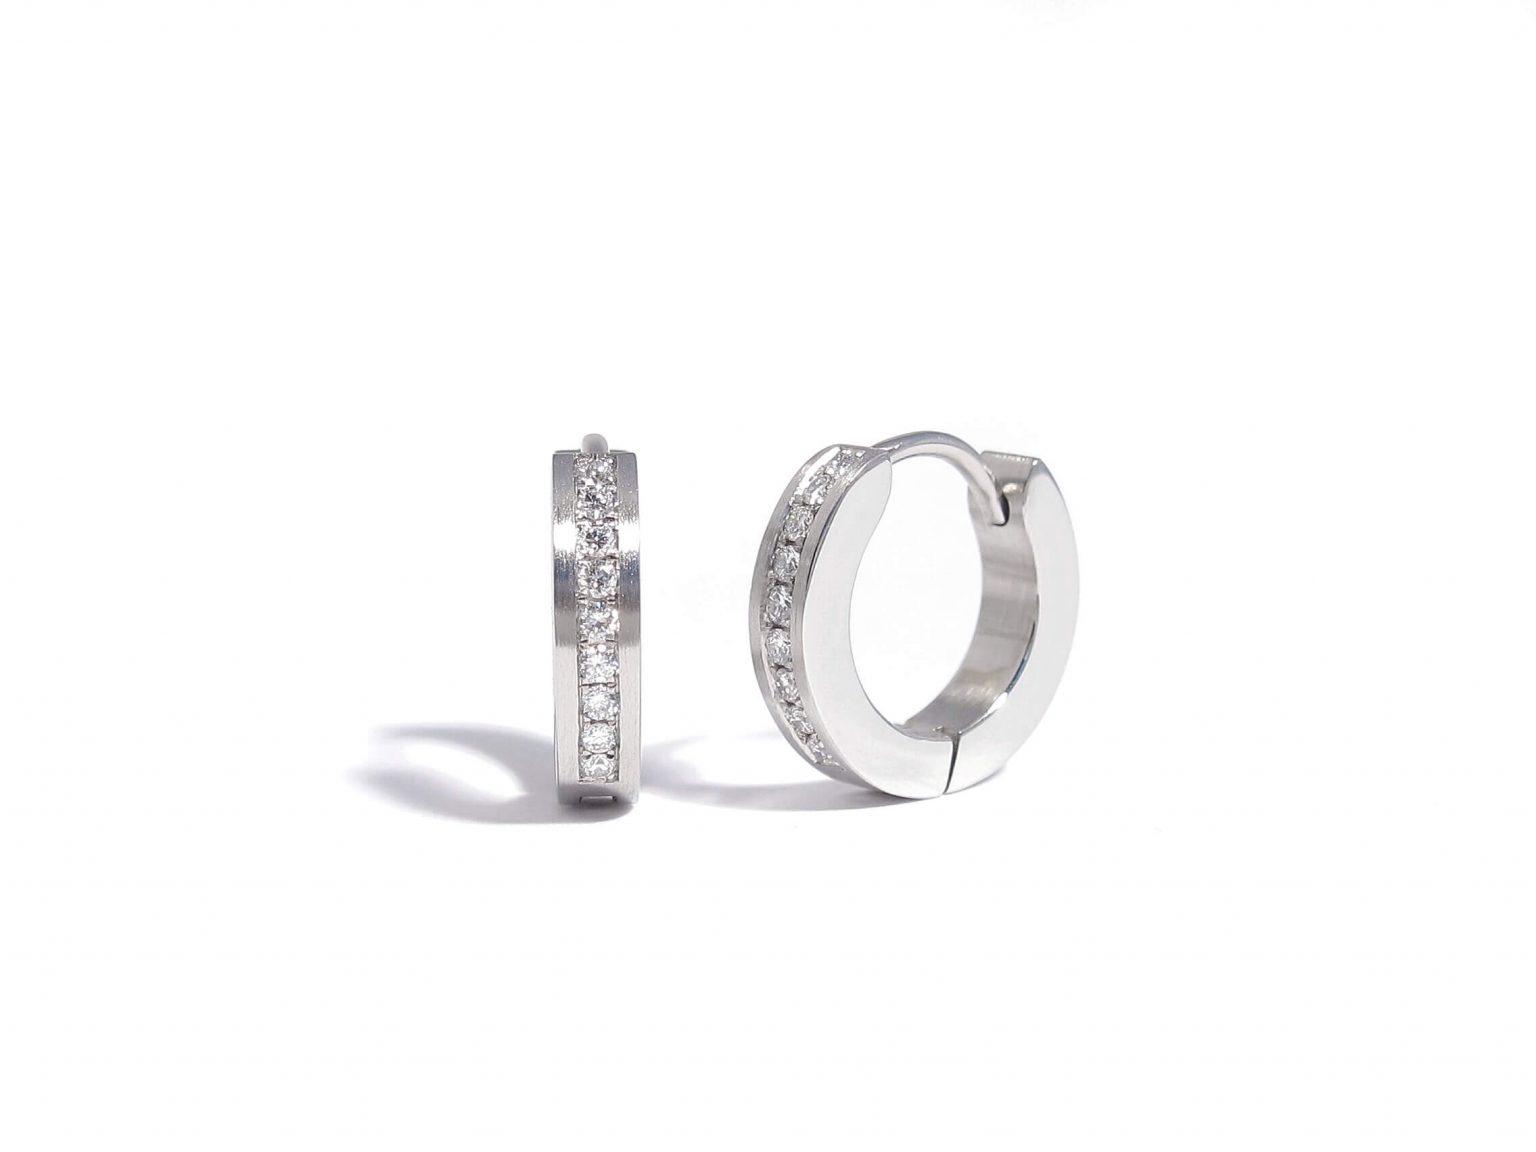 diamond and steel earrings